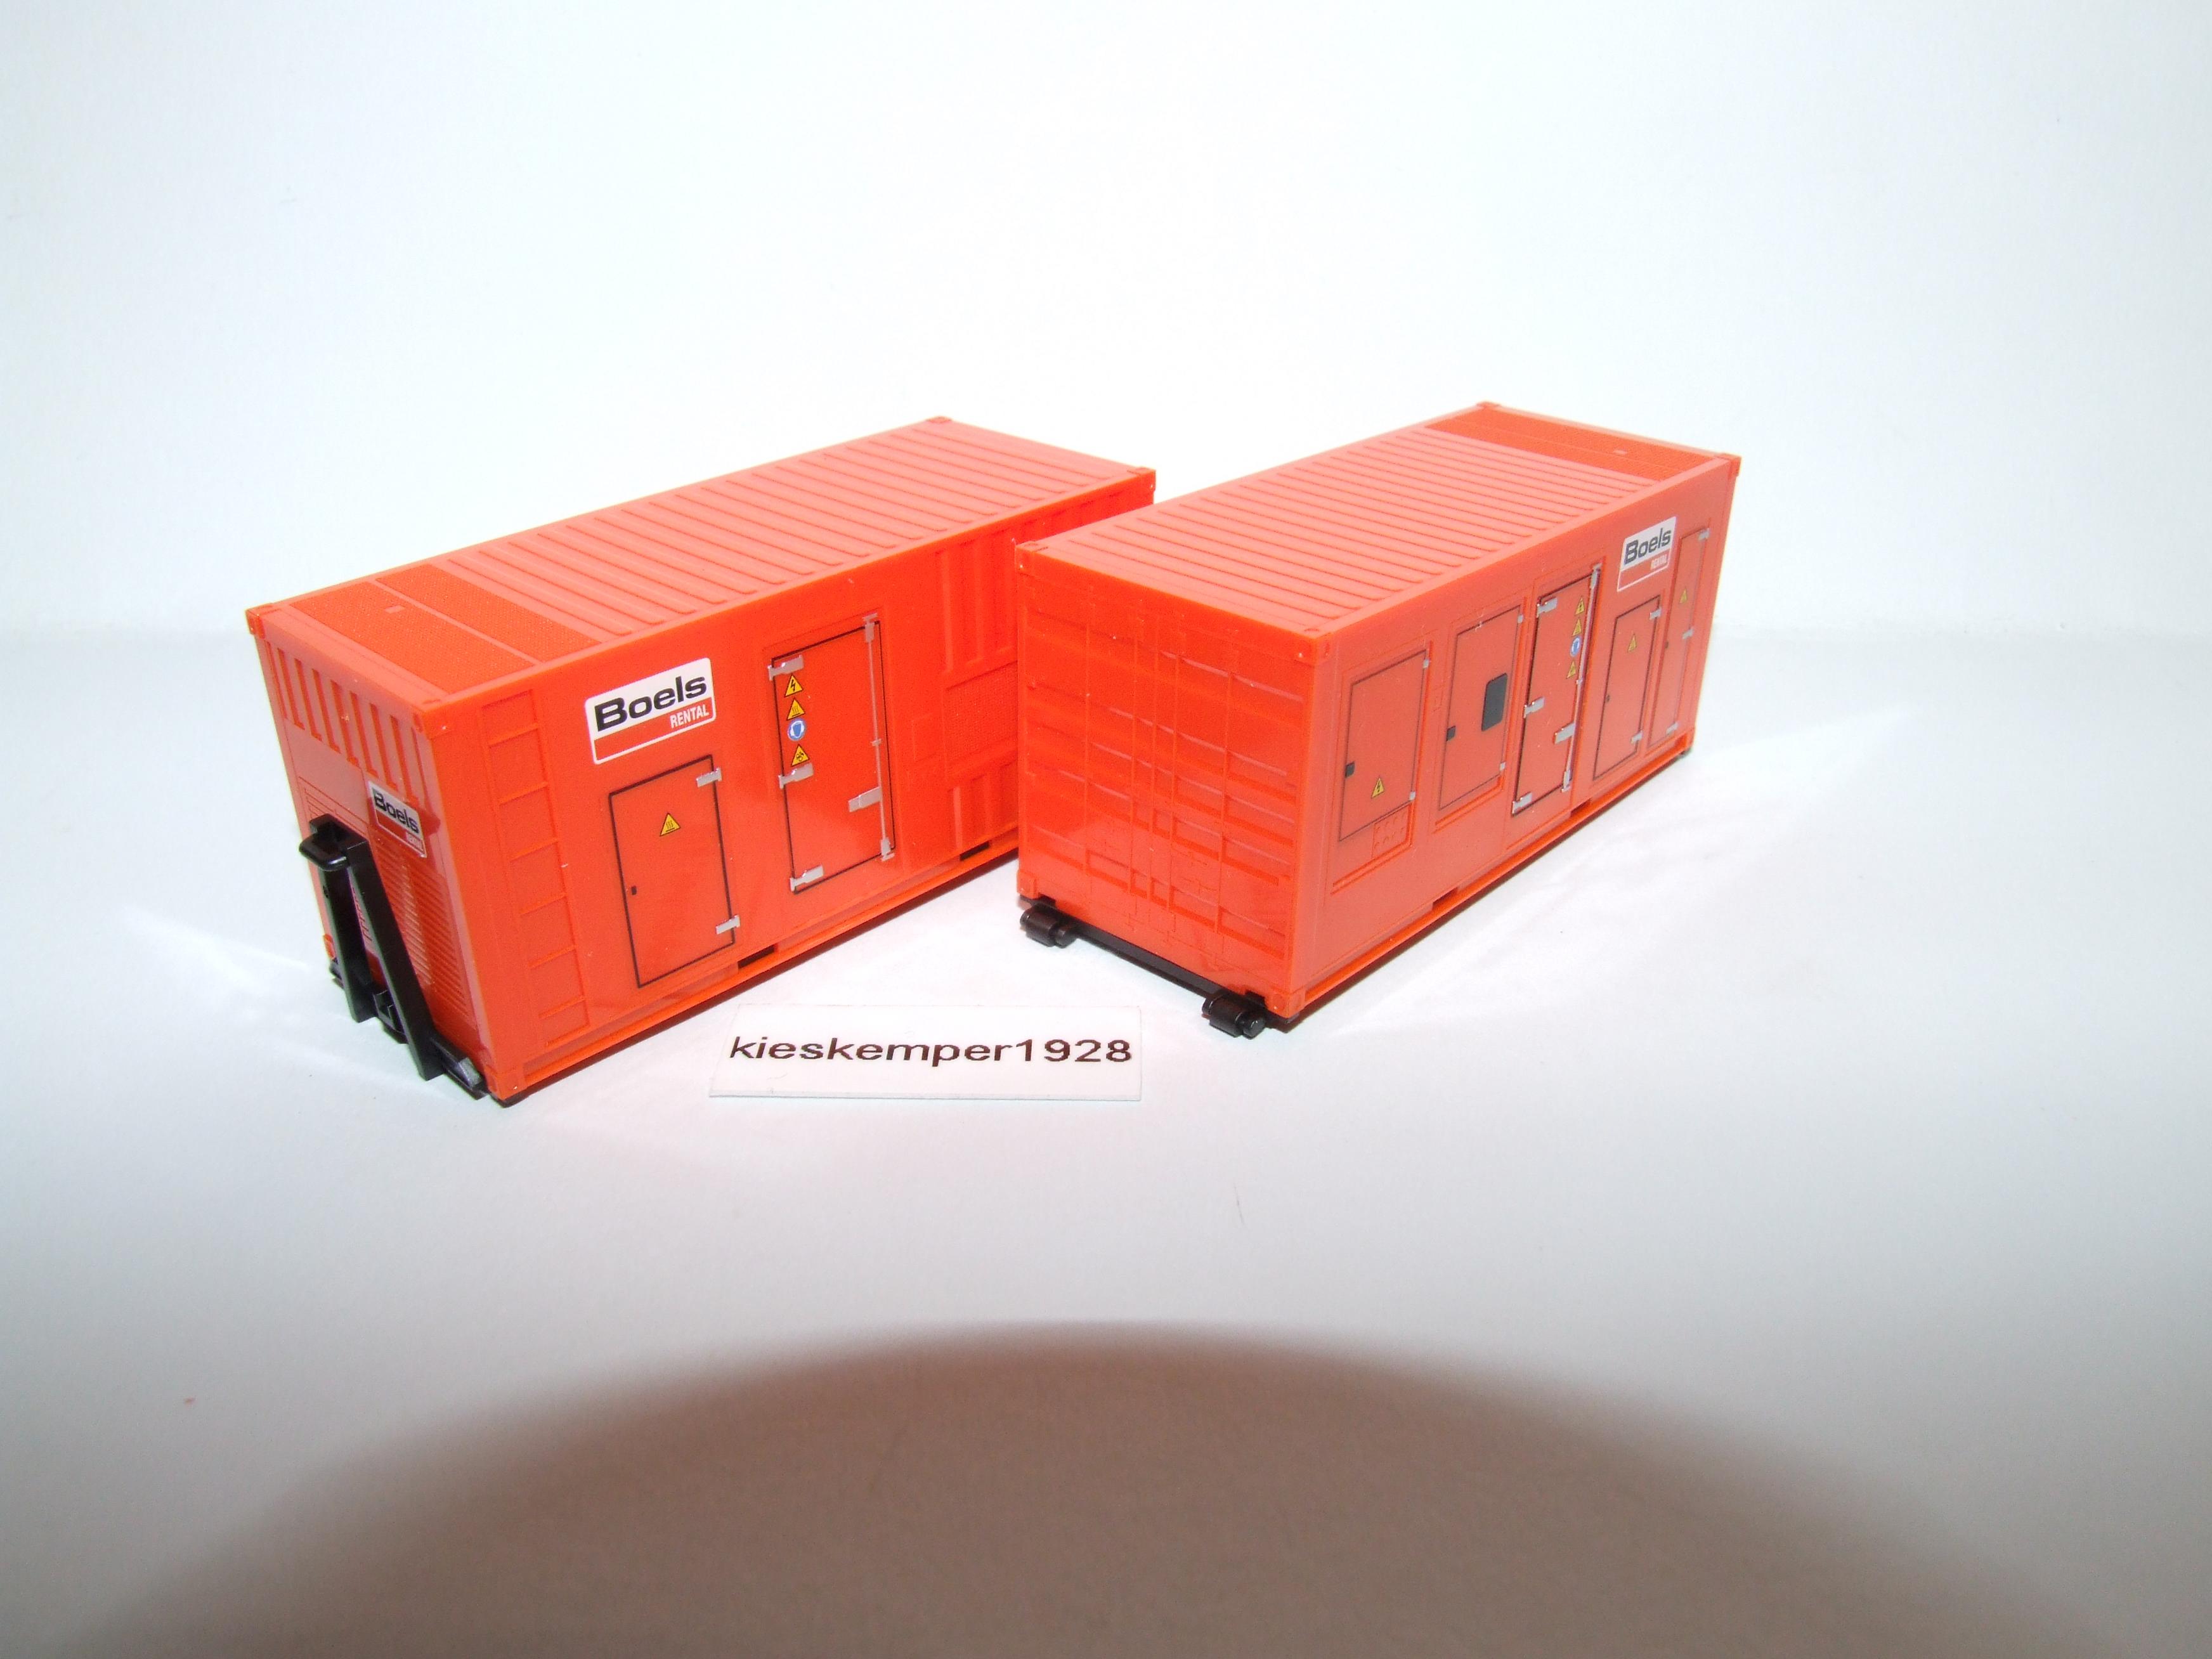 Cont Stromaggregat Boels 076890 Herpa Set 2x20 ft